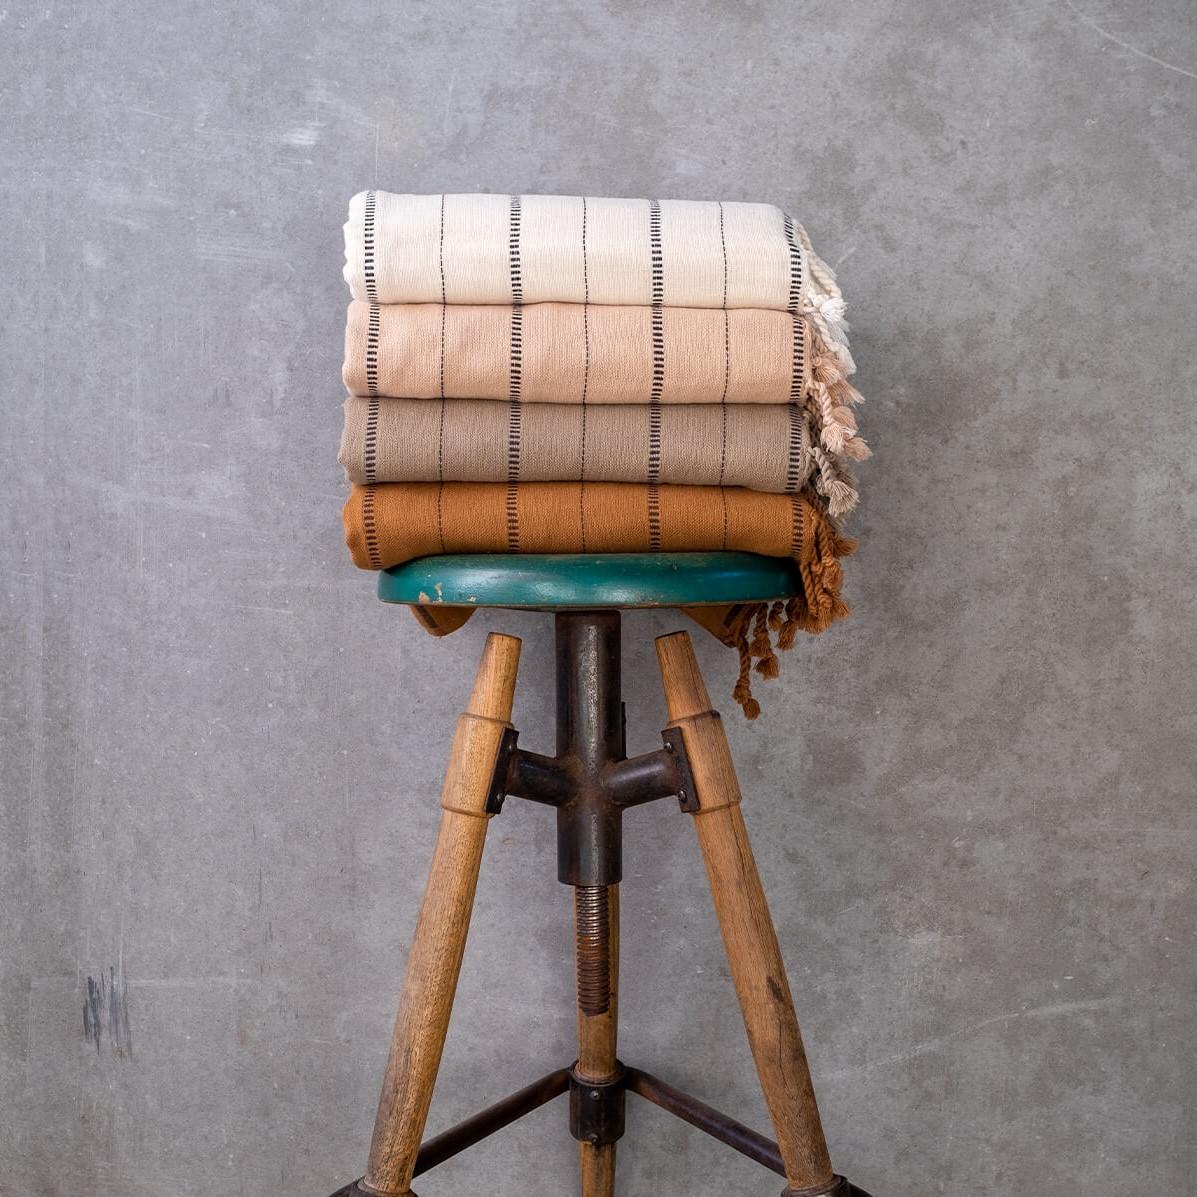 boa-koltuk-sali-bej-siyah02-1200×1600